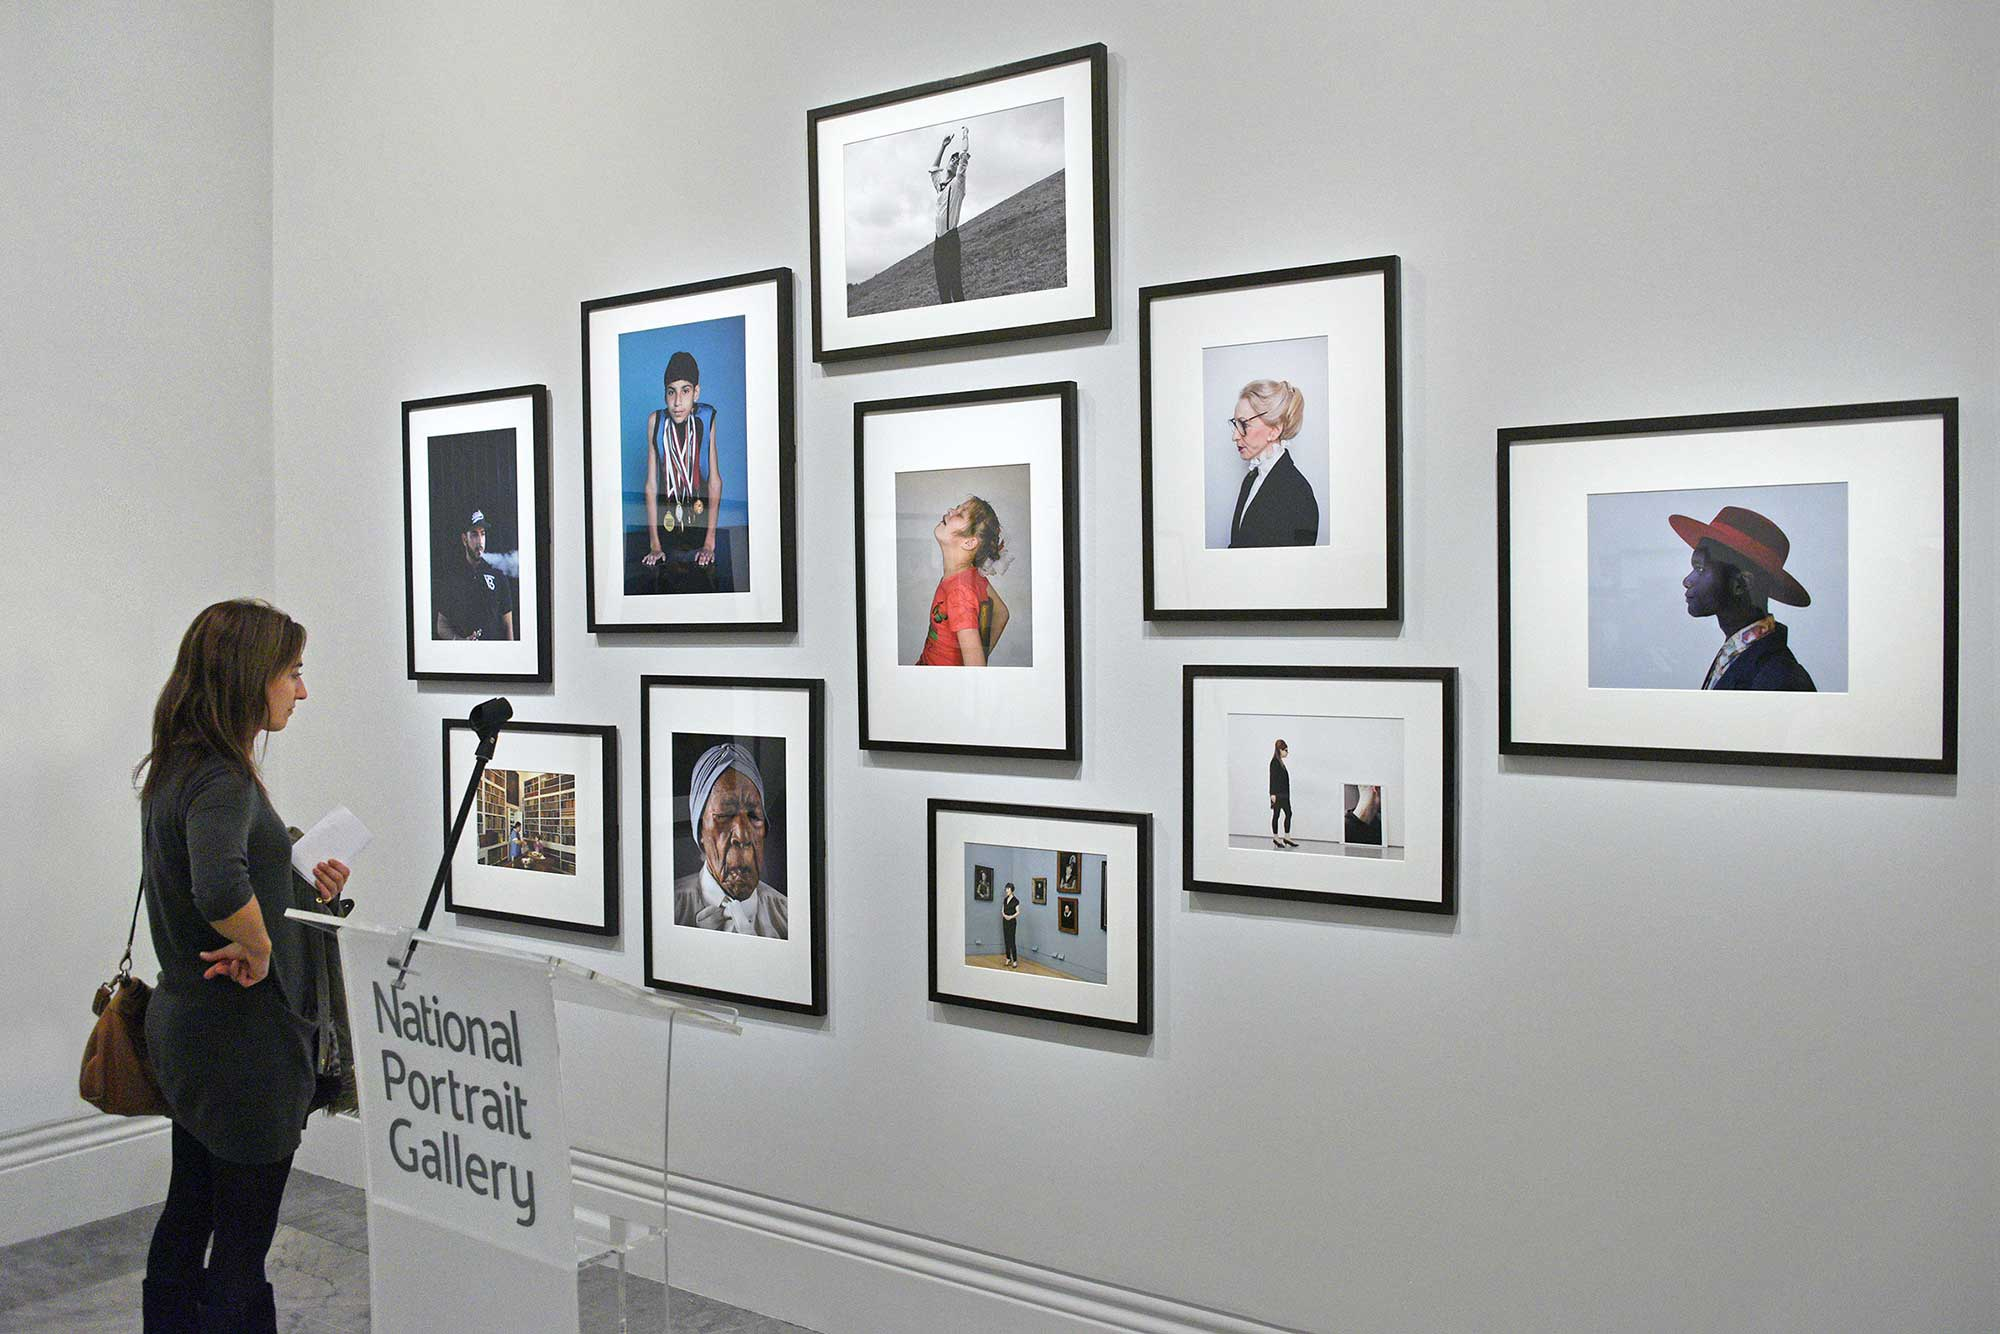 Taylor Wessing Photographic Portrait Prize 2016, National Portrait Gallery London